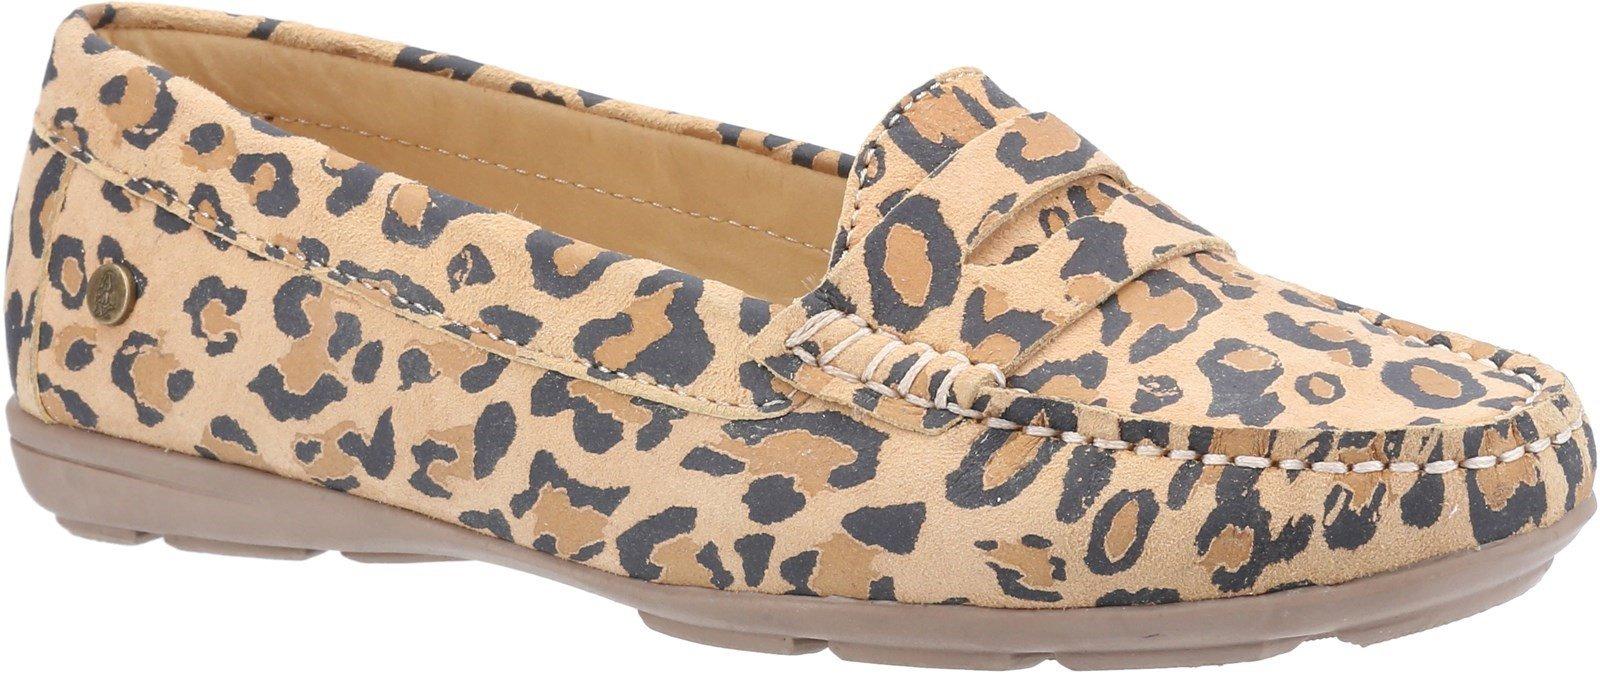 Hush Puppies Women's Margot Slip On Loafer Leopard 30238 - Leopard 3